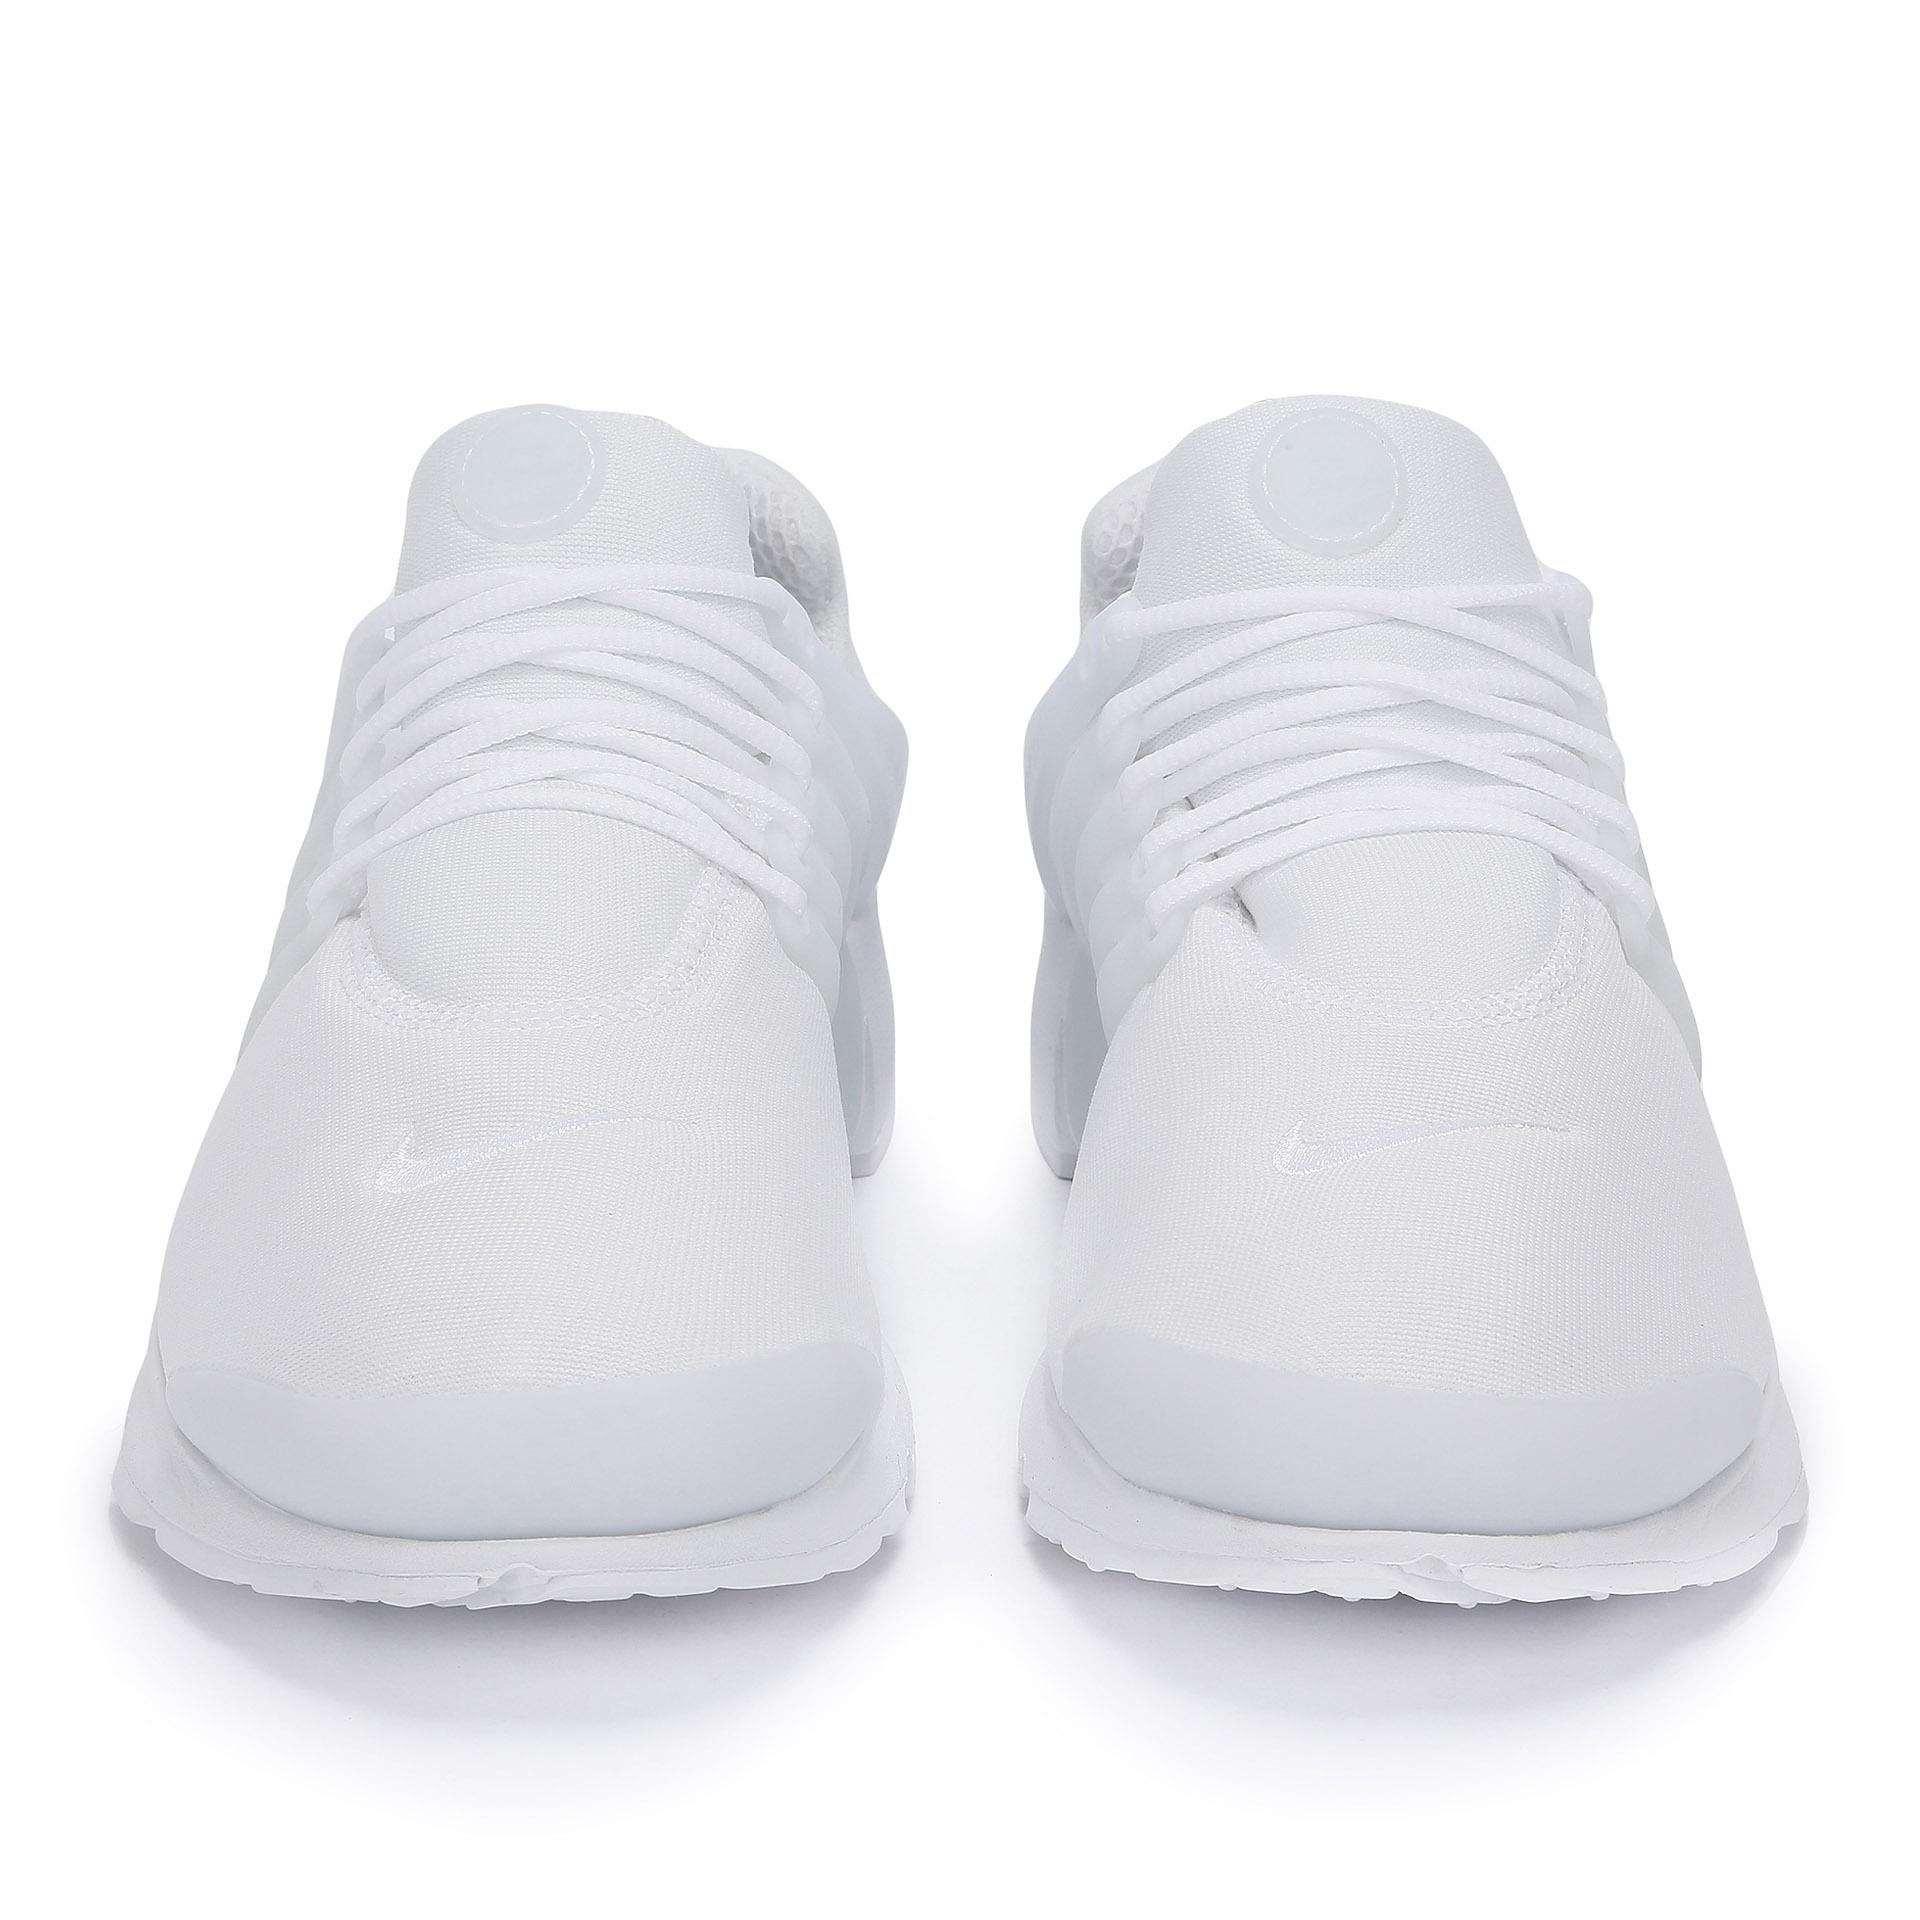 709defc3 Кроссовки Presto от Nike (848187-100) - продажа, цена, фото, описание